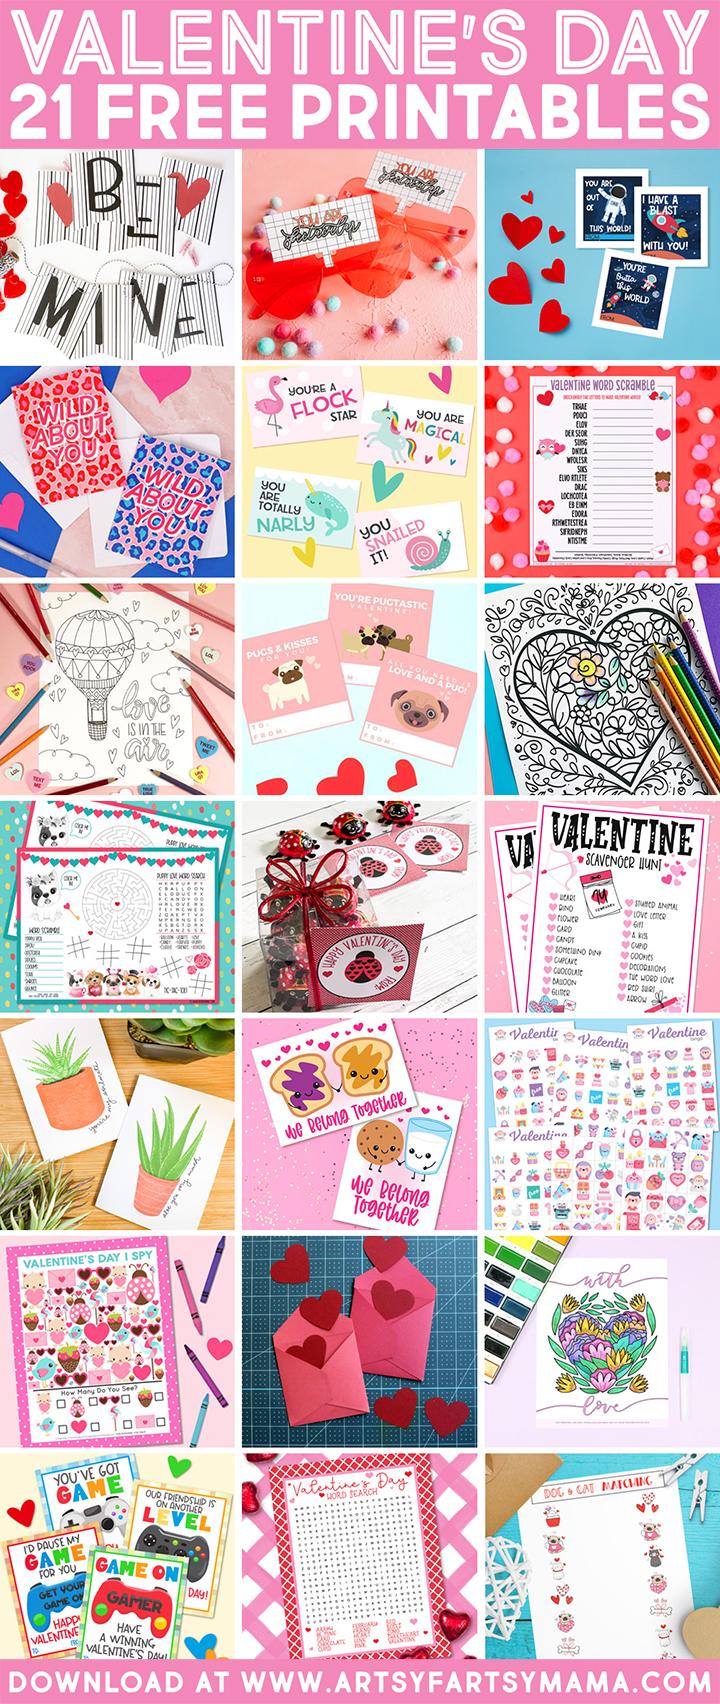 21 Free Valentine's Day Printables